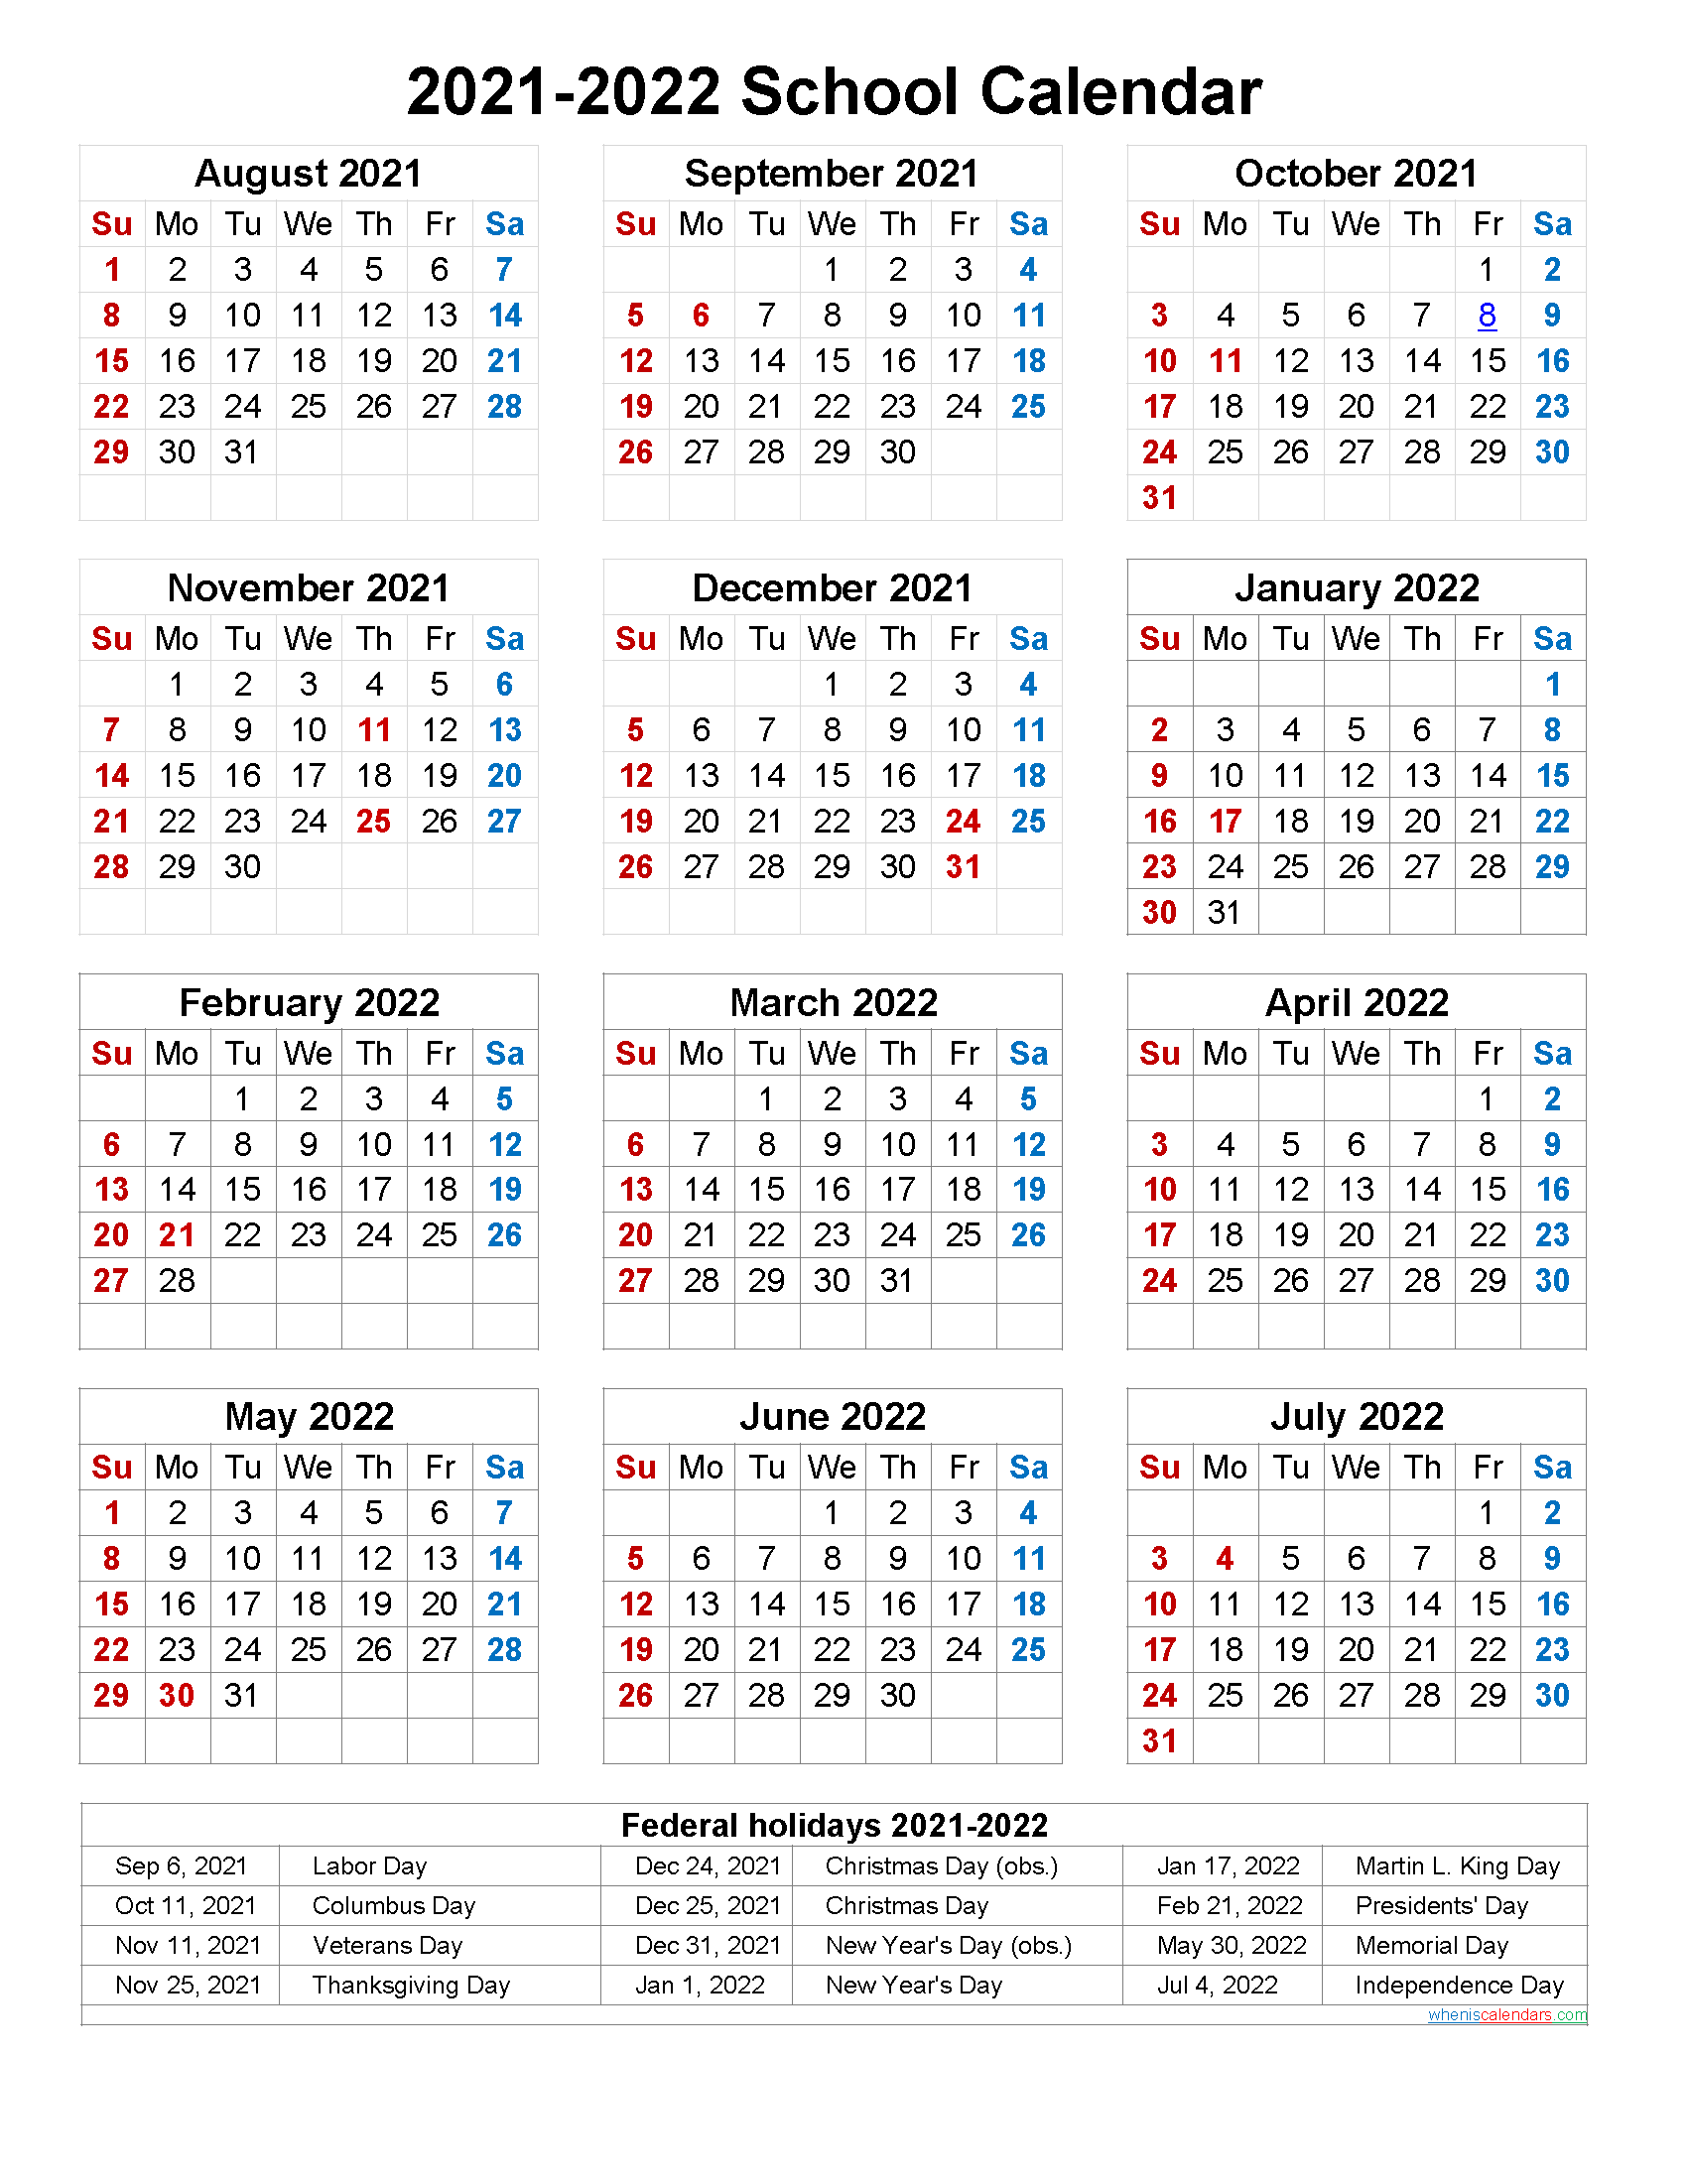 Calendrier Federale 2 2021 2022 School Calendar 2021 and 2022 Printable (Portrait)  Template No